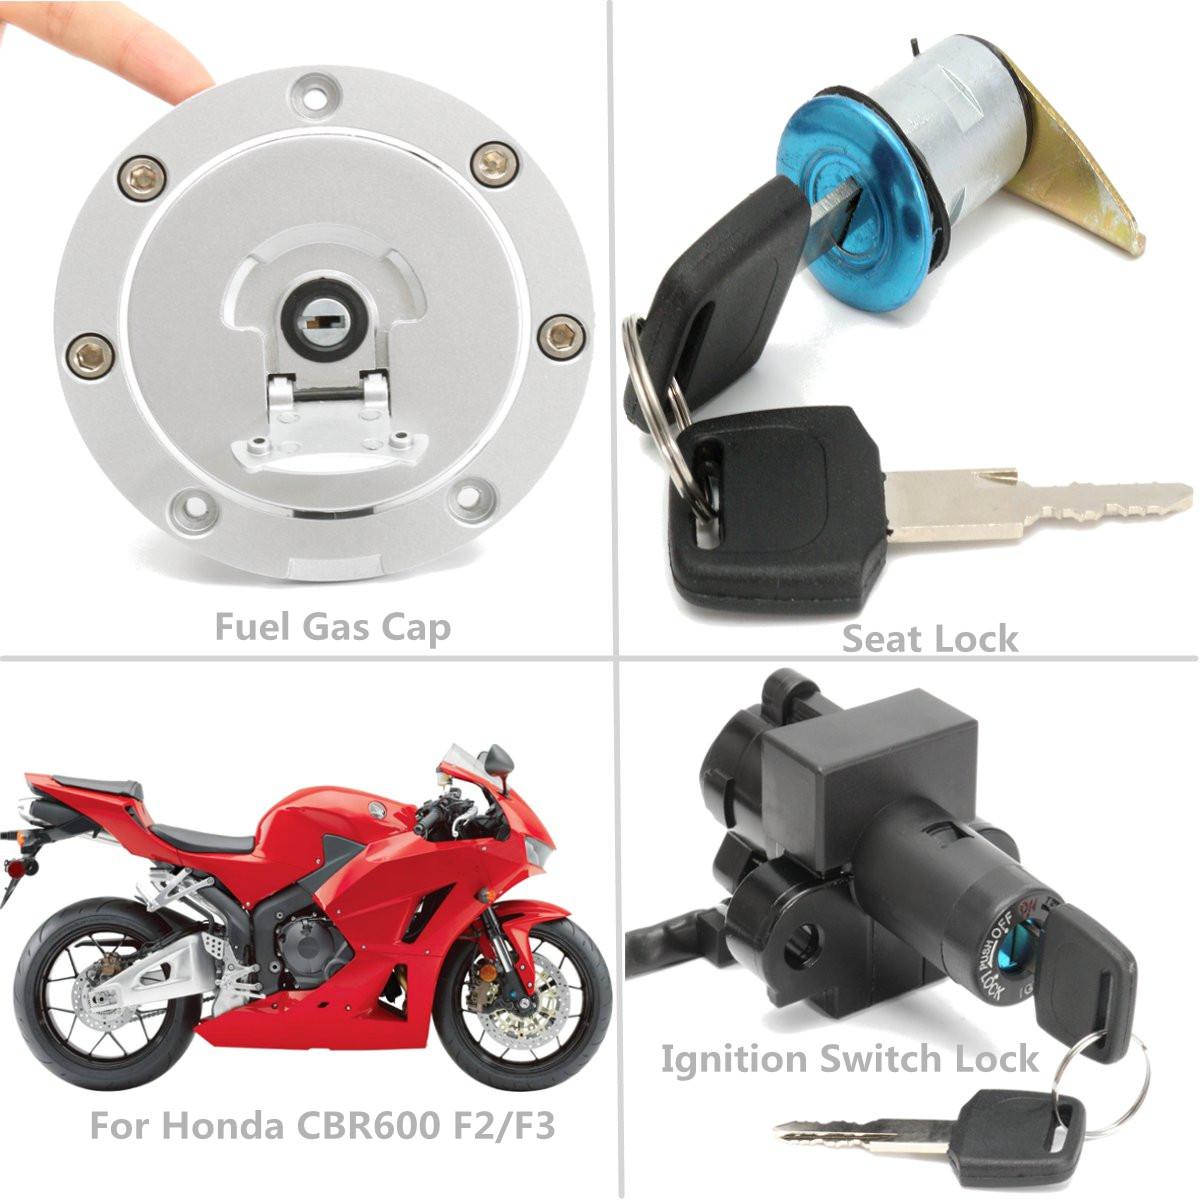 Aluminum Ignition Switch Lock Fuel Gas Cap Key Set For Honda Cbr600 2004 Cbr600rr Wiring F3 1995 1998